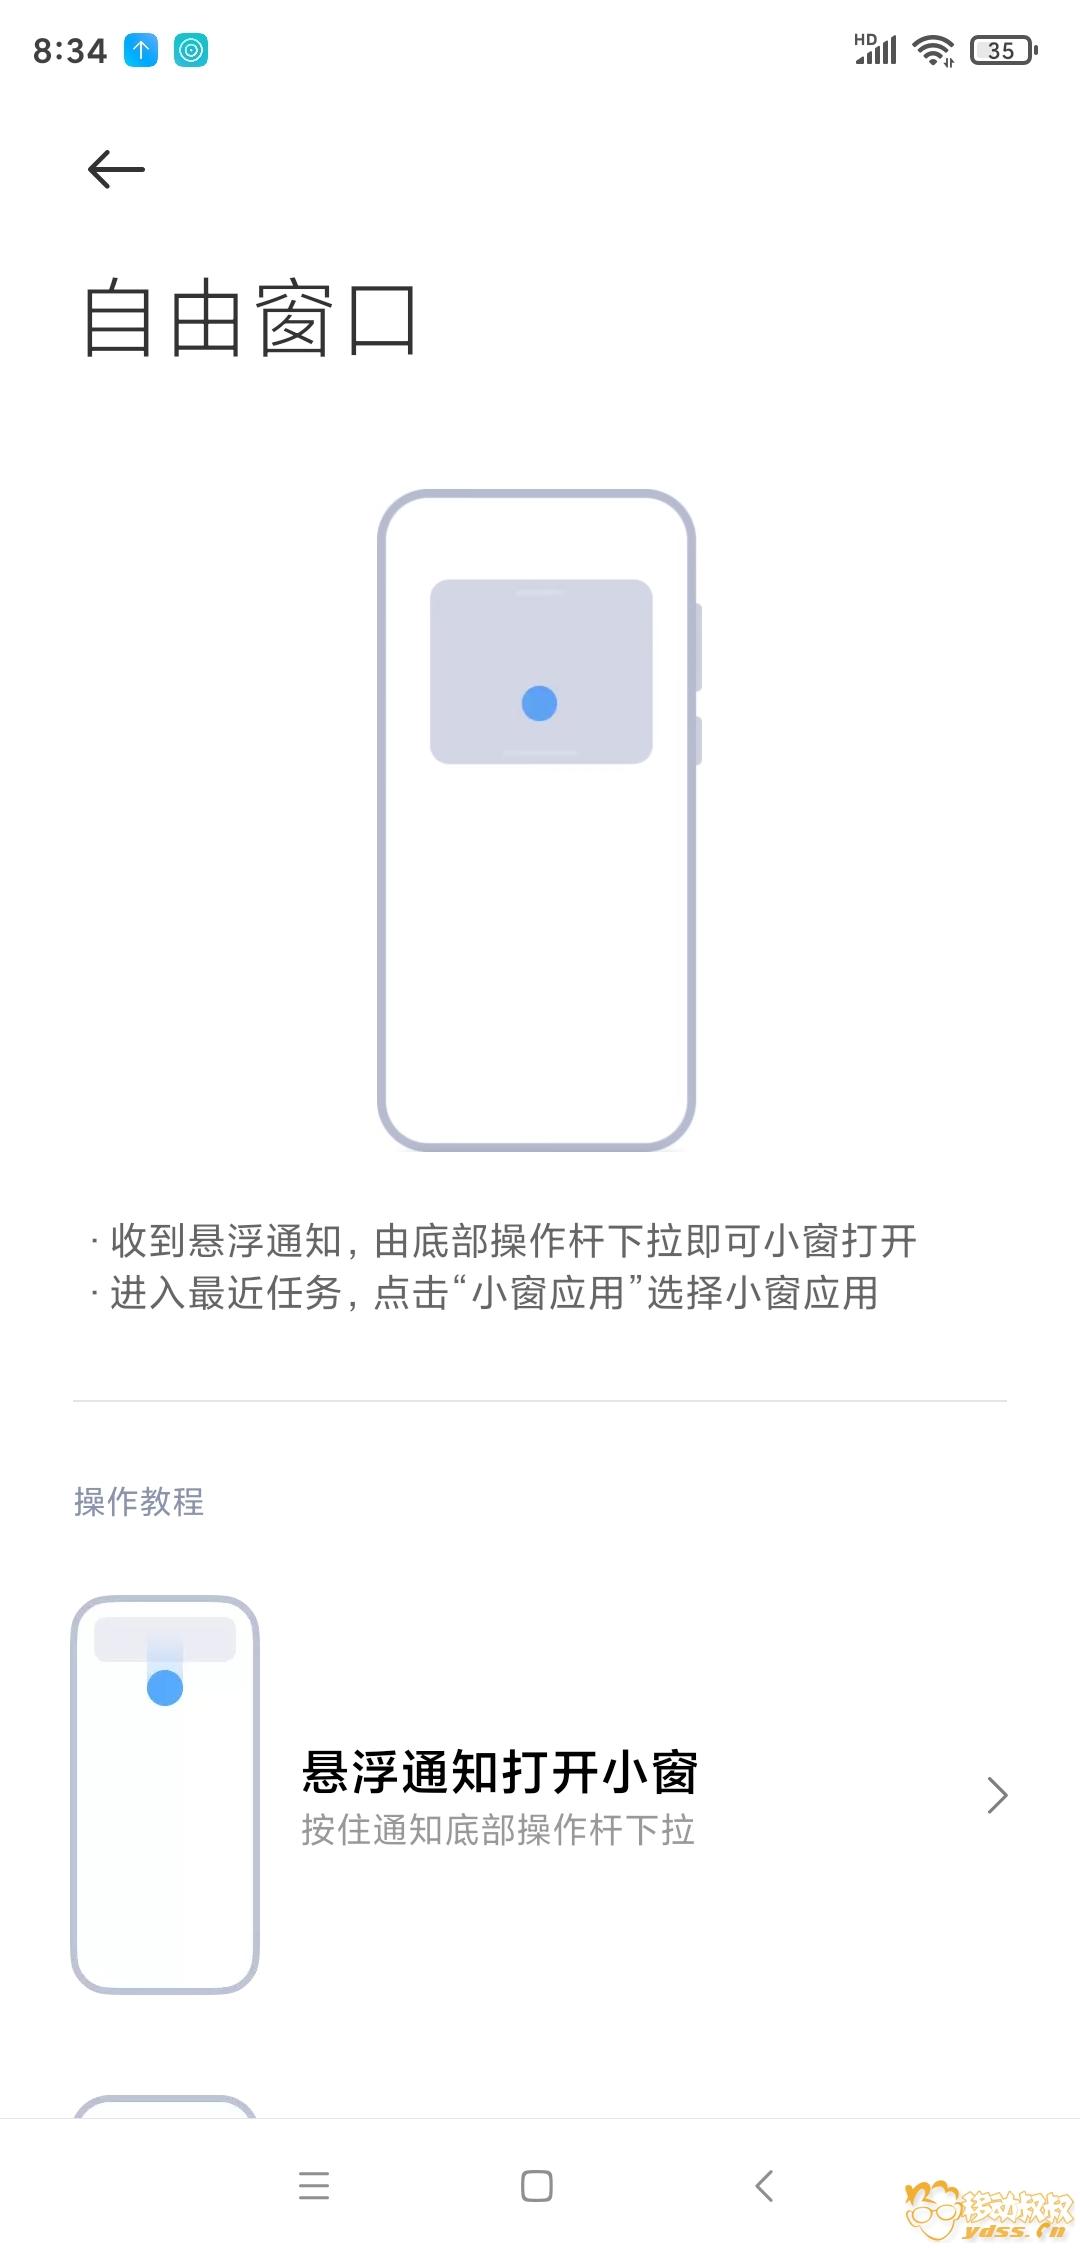 Screenshot_2020-04-30-08-34-28-583_com.android.settings.jpg